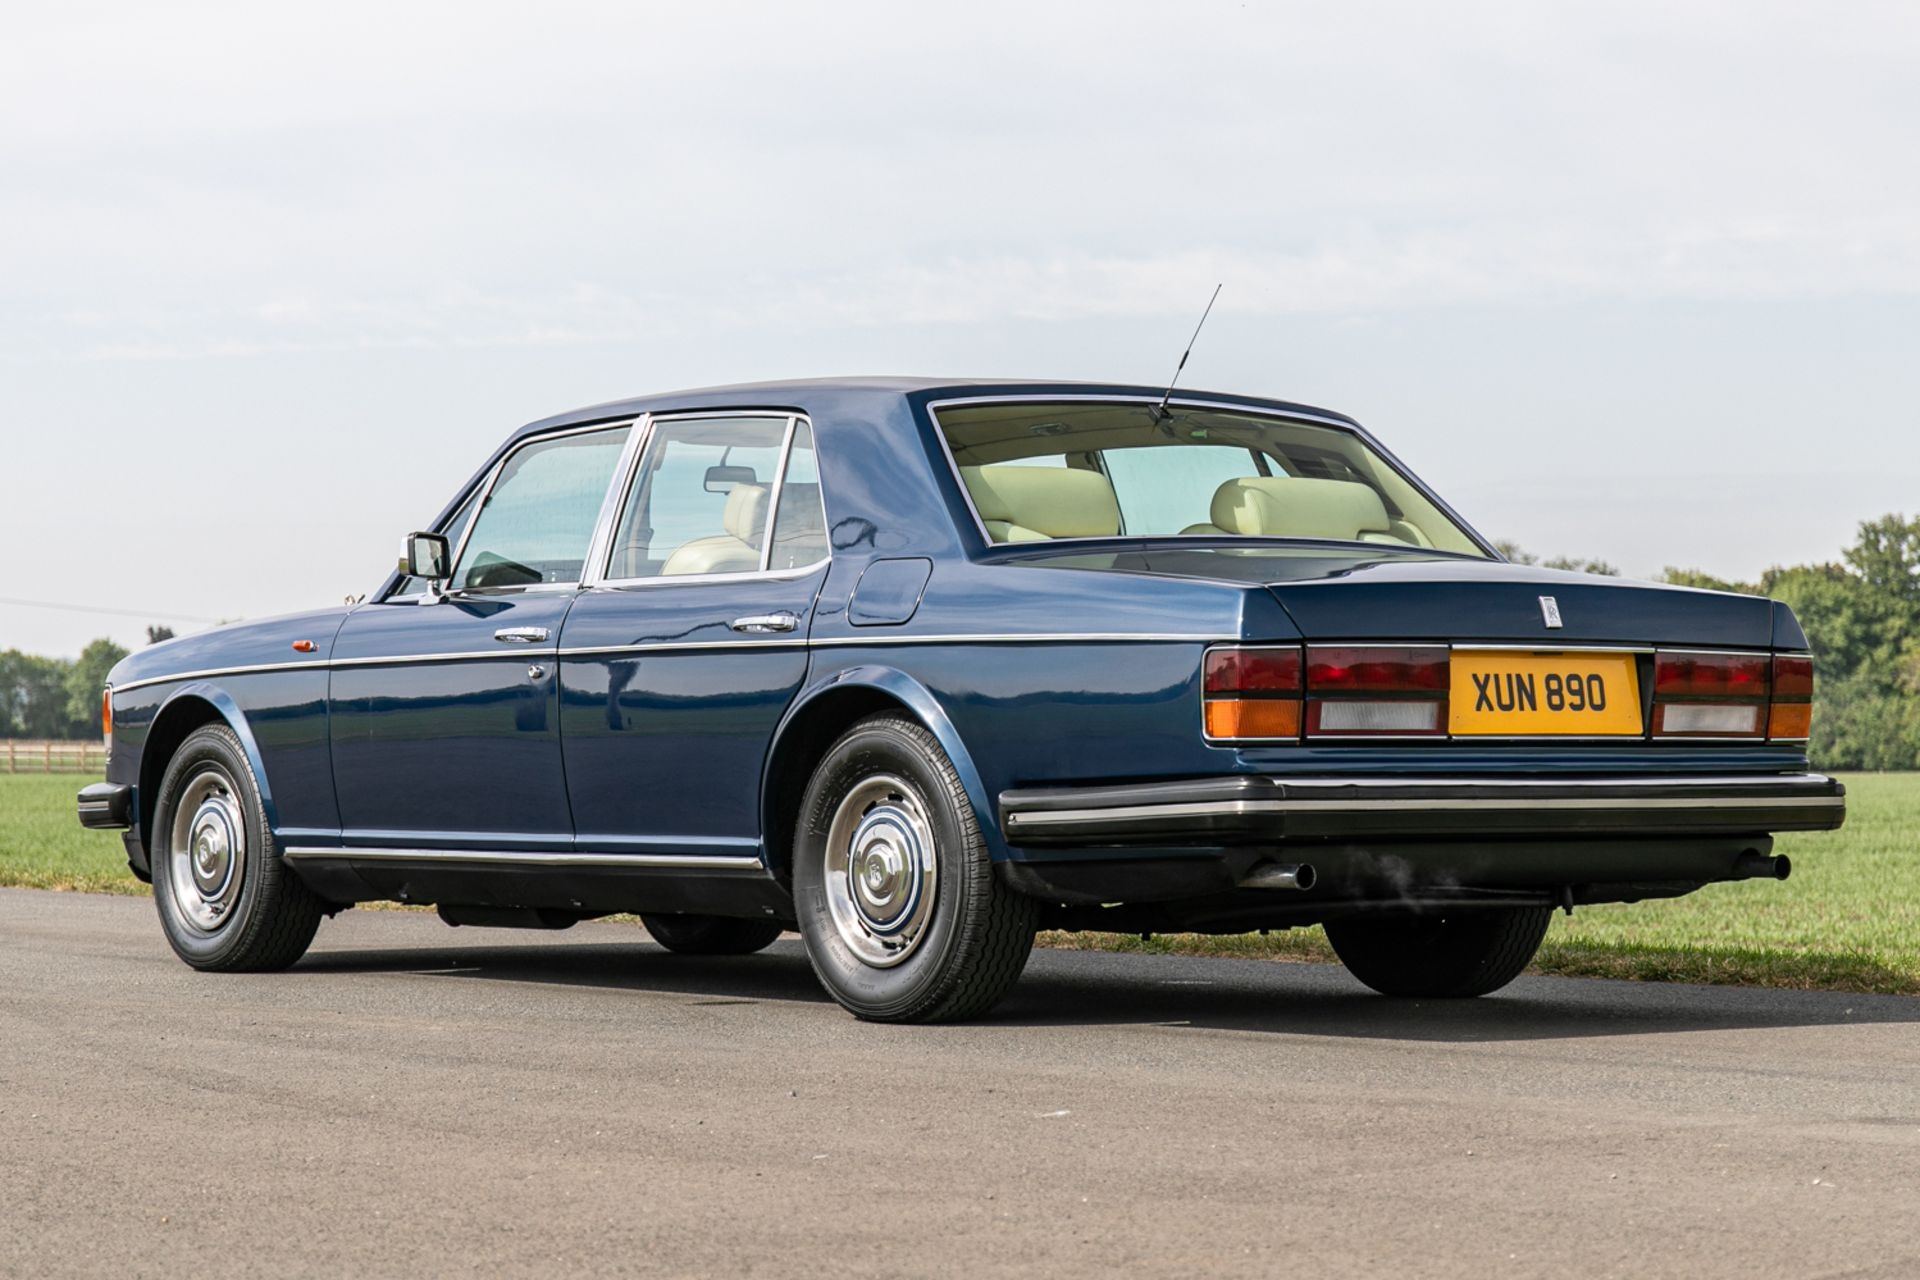 Lot 102 - 1982 Rolls-Royce Silver Spirit